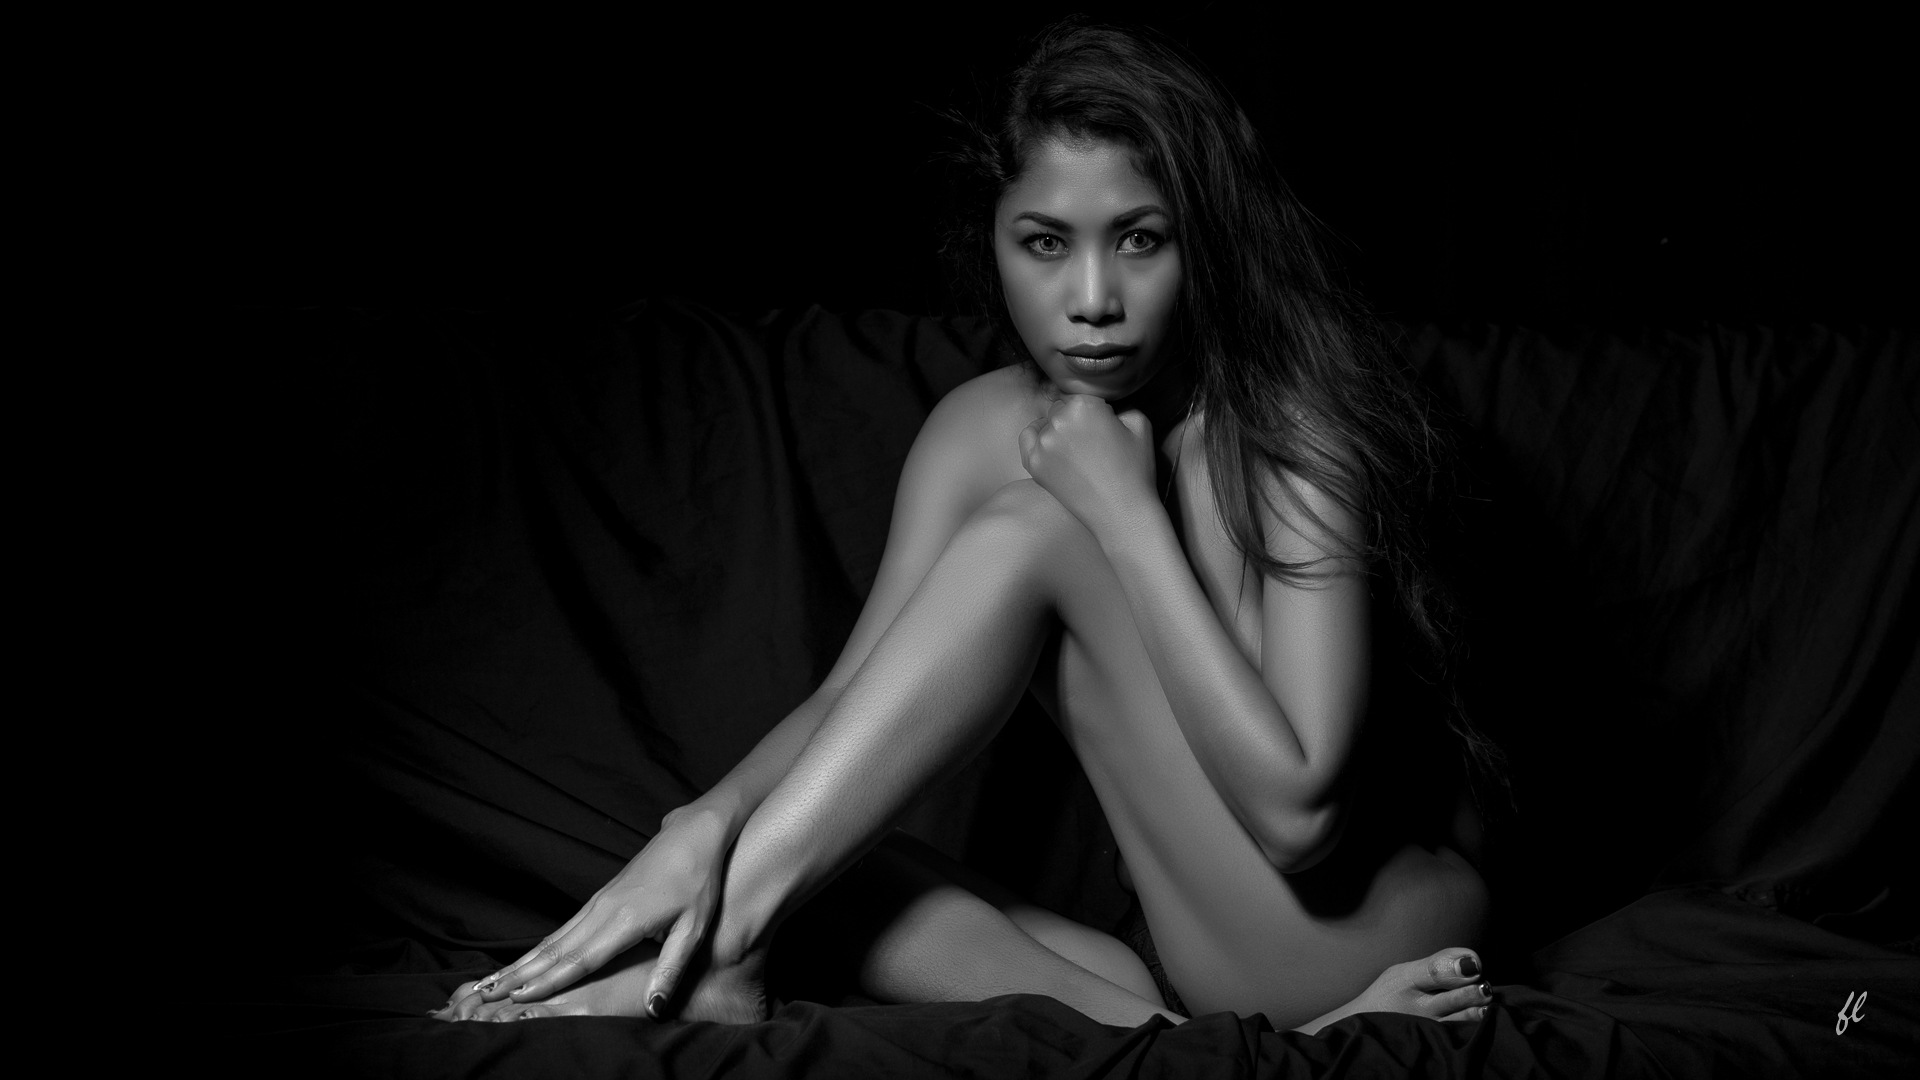 In a black room.. by Dragunars